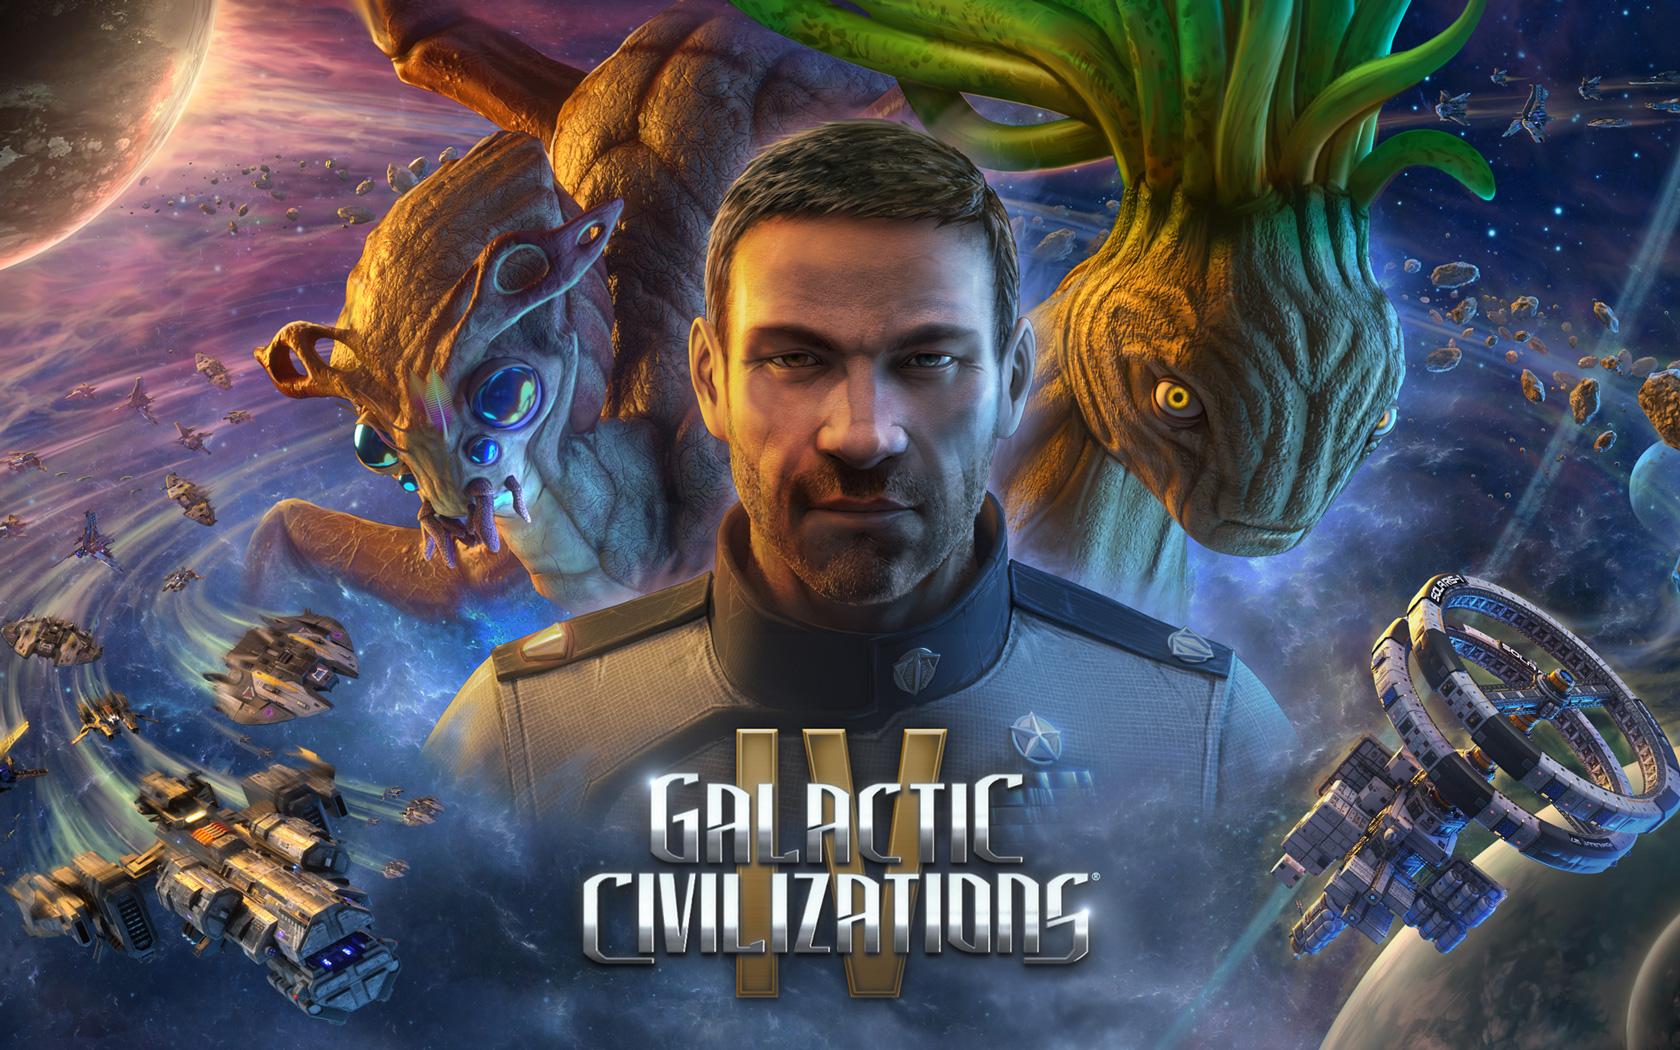 Free Galactic Civilizations IV Wallpaper in 1680x1050